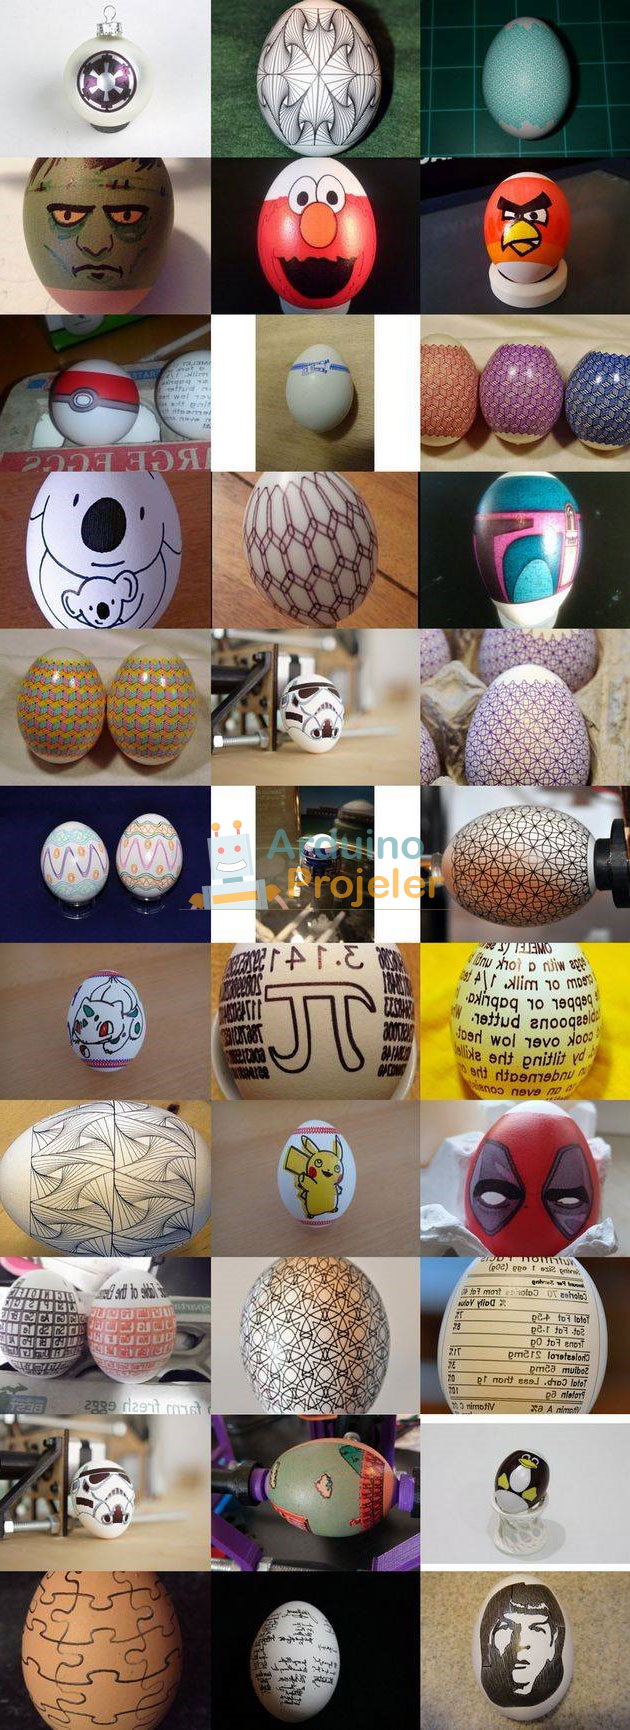 Arduino Yumurta Boyacı